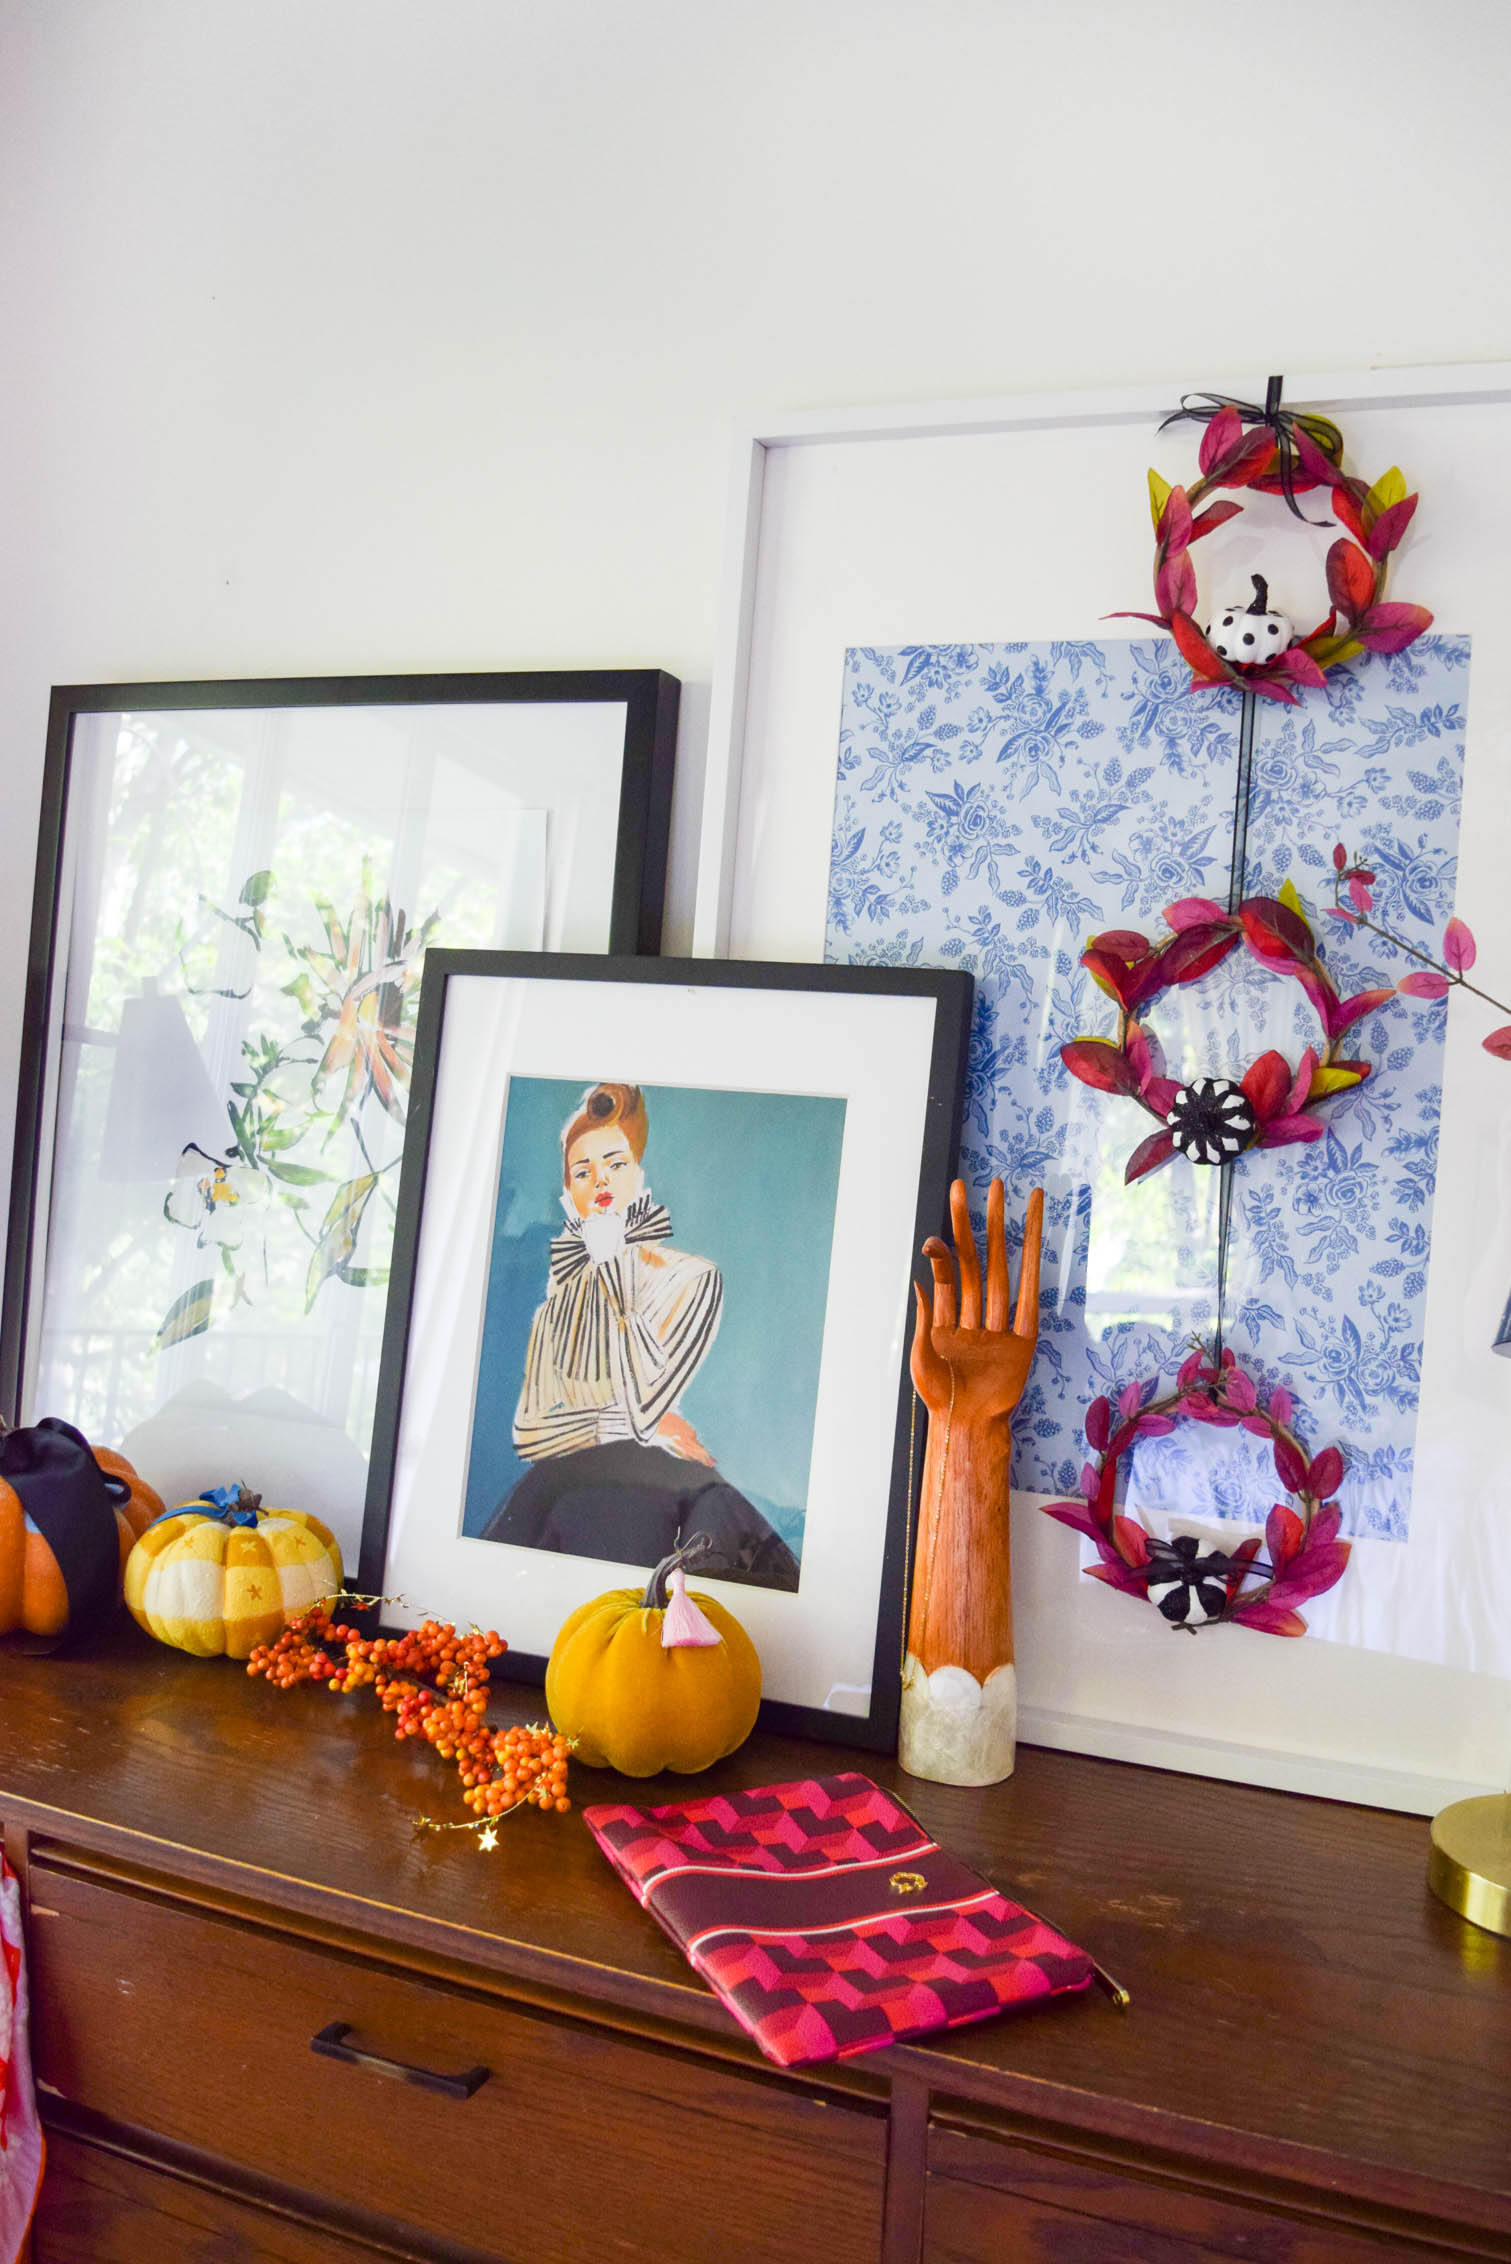 side shot of purple fall wreaths against art display